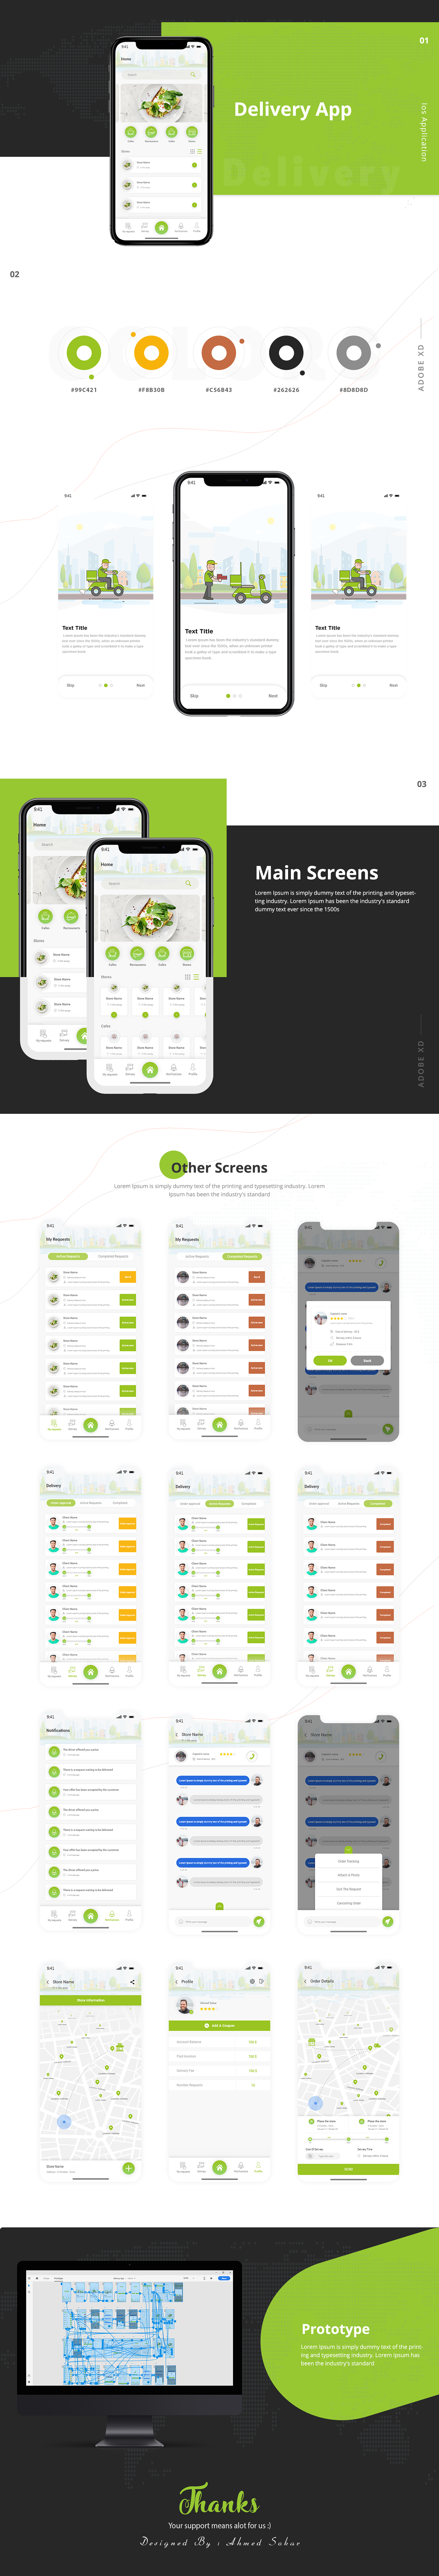 delivery app ux UI photoshop Webdesign